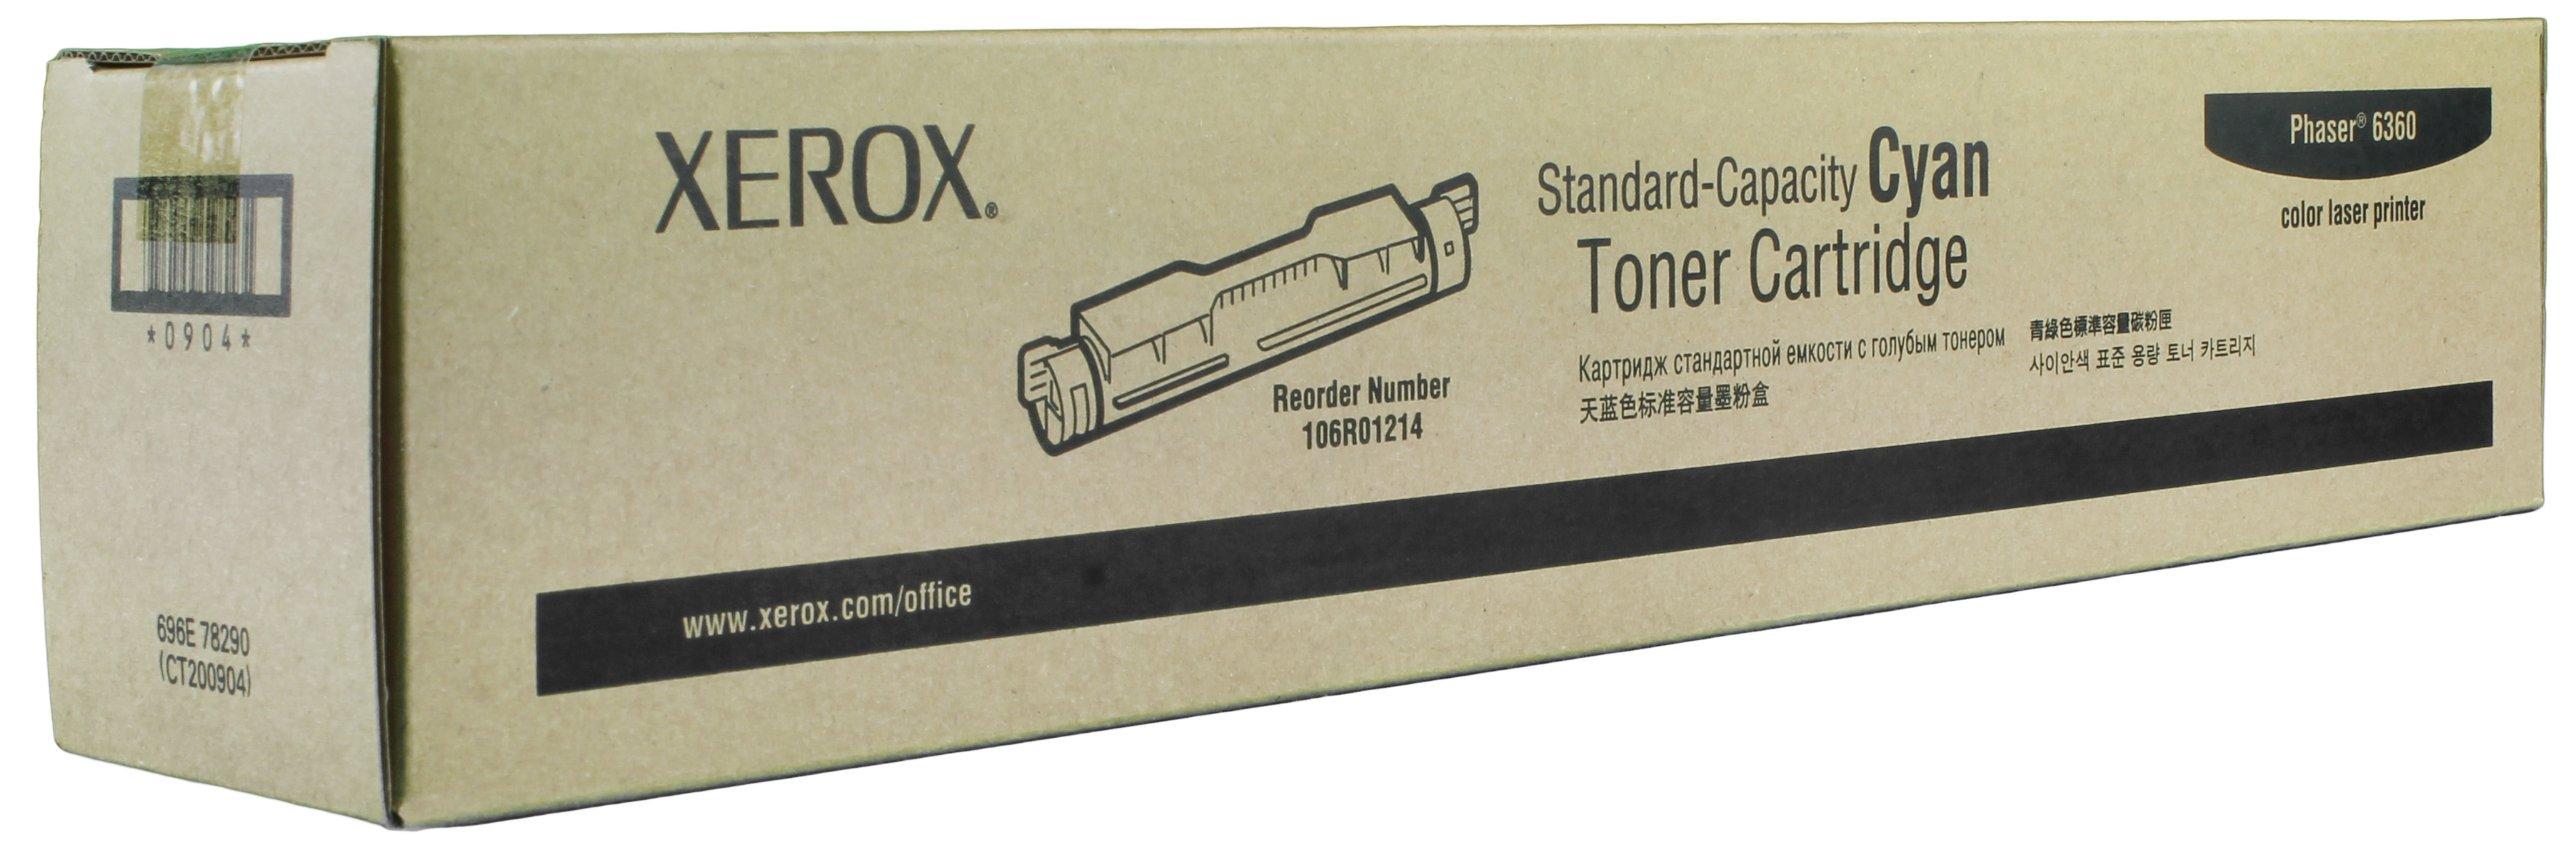 Toner Original XEROX 106R01214 Phaser 6360 (Cyan)